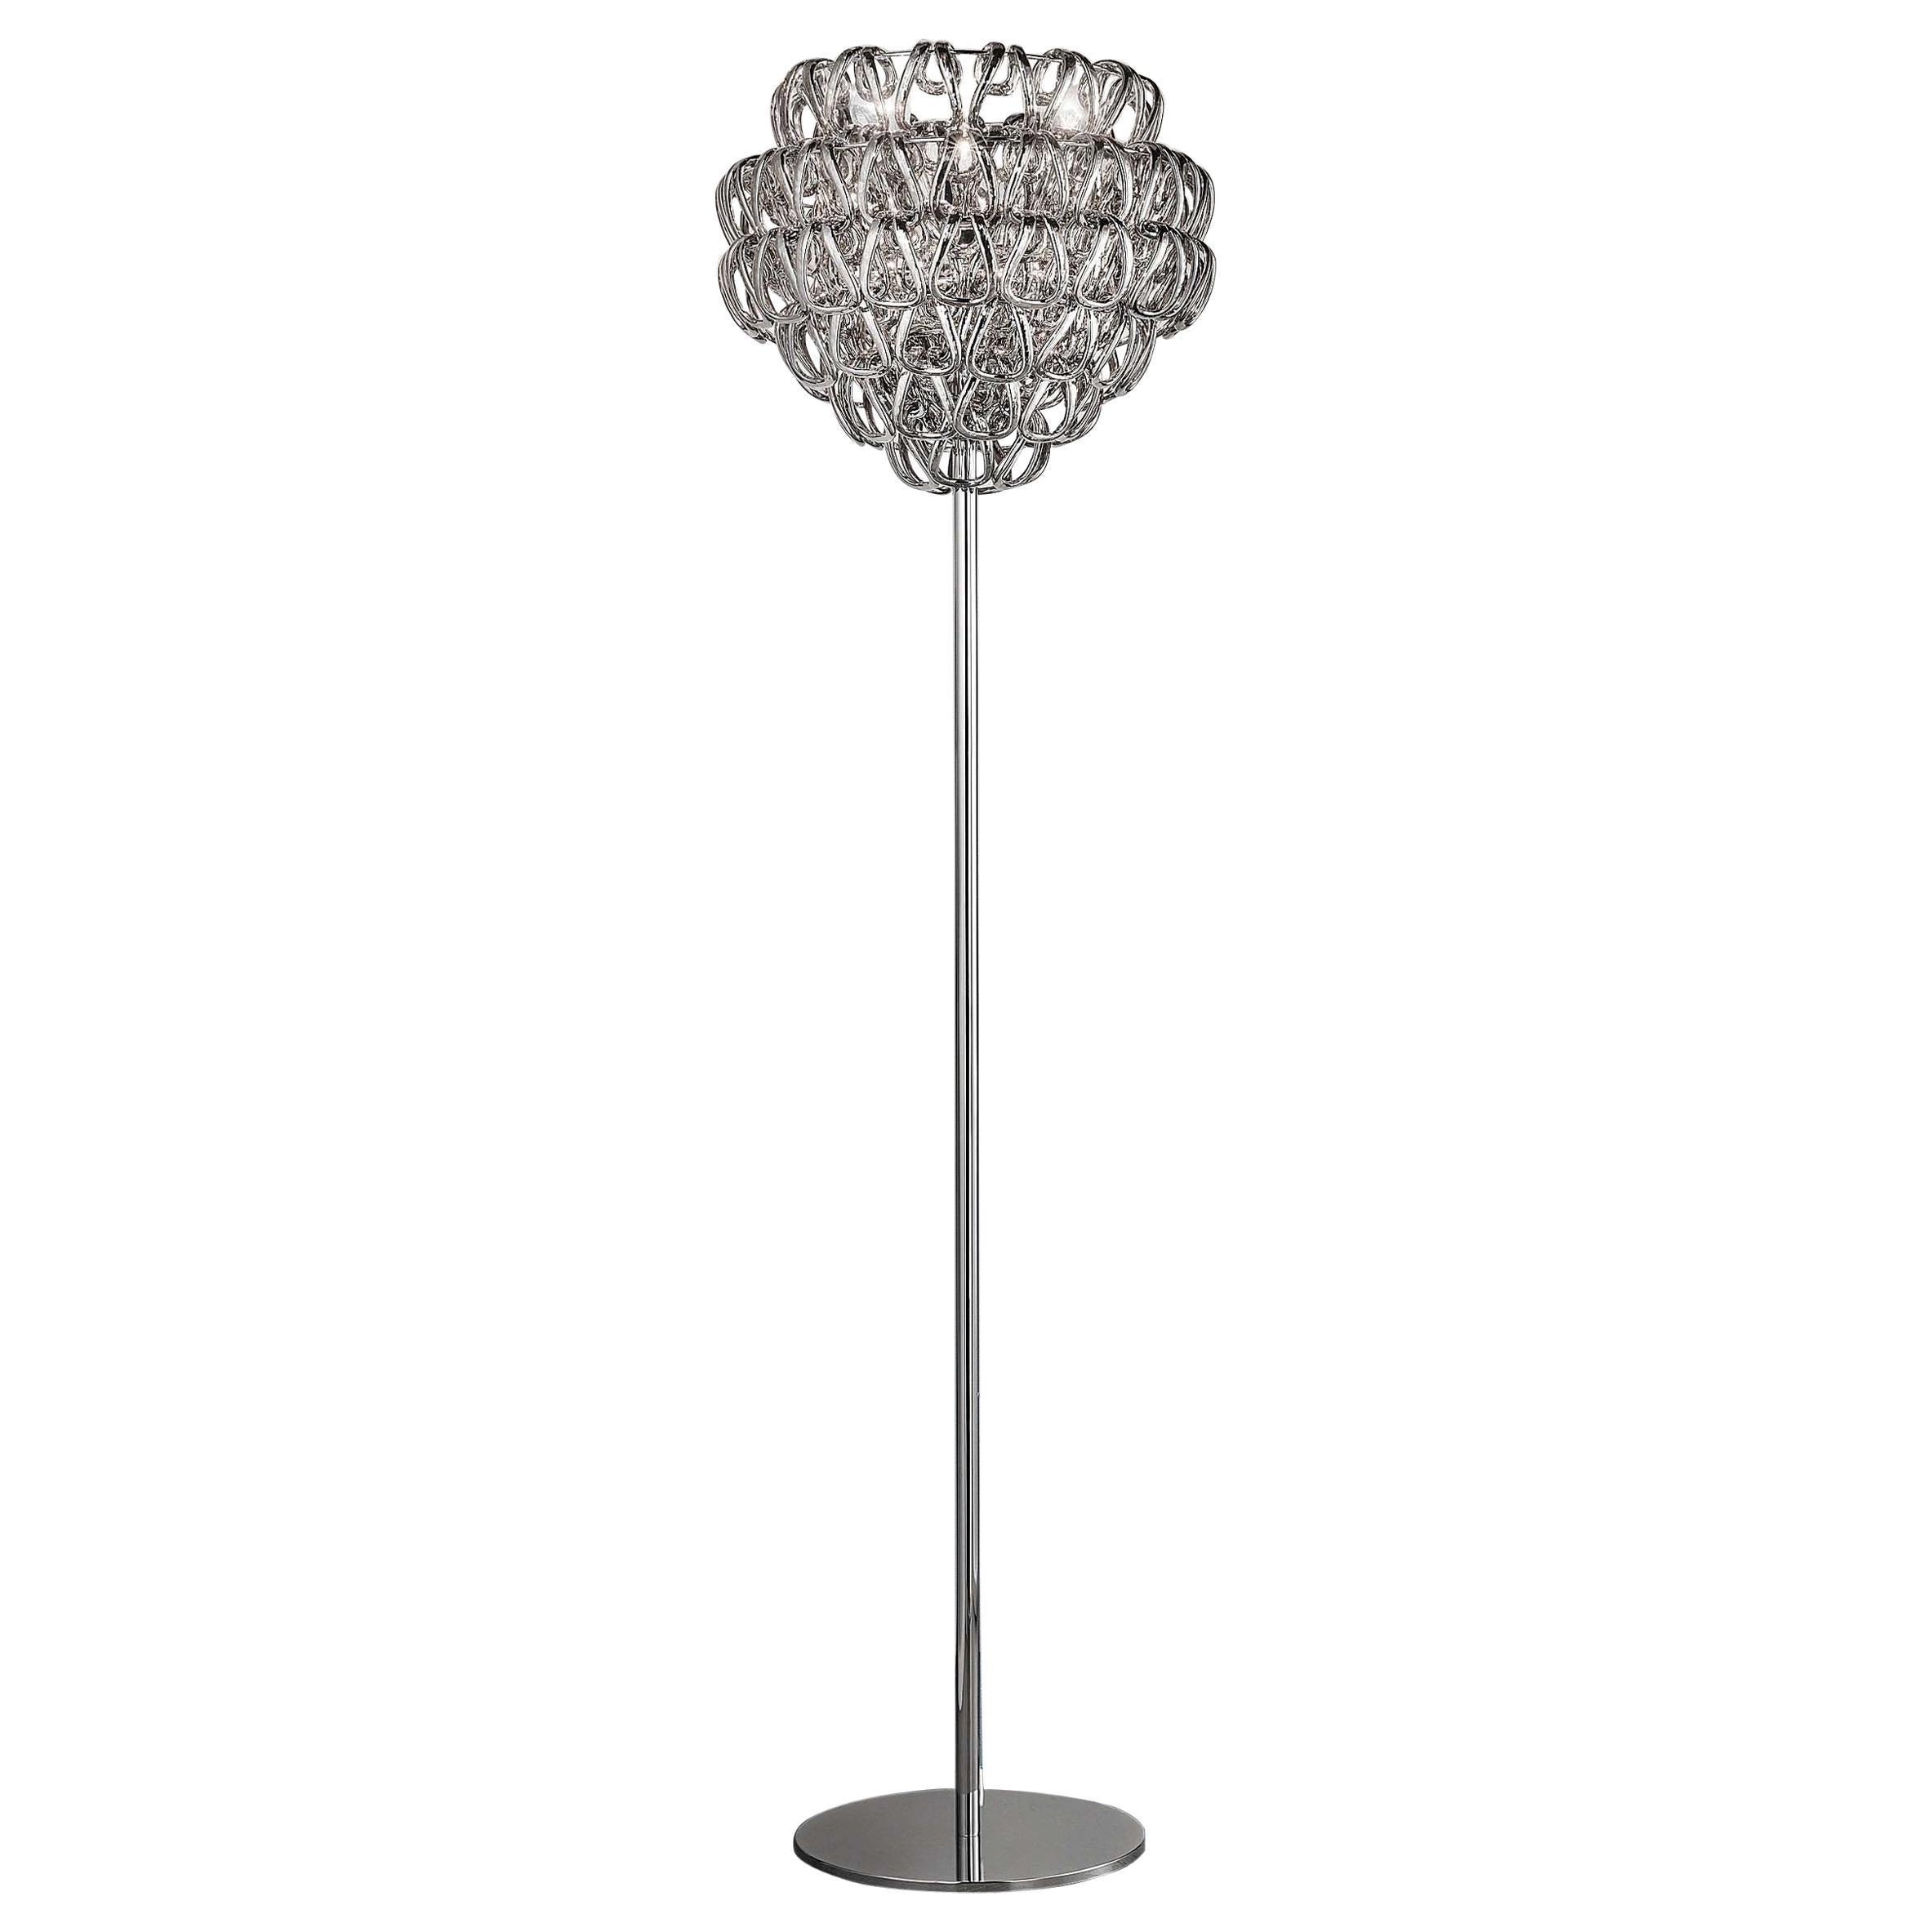 Vistosi Giogali Floor Lamp with Glossy Chrome Base by Angelo Mangiarotti